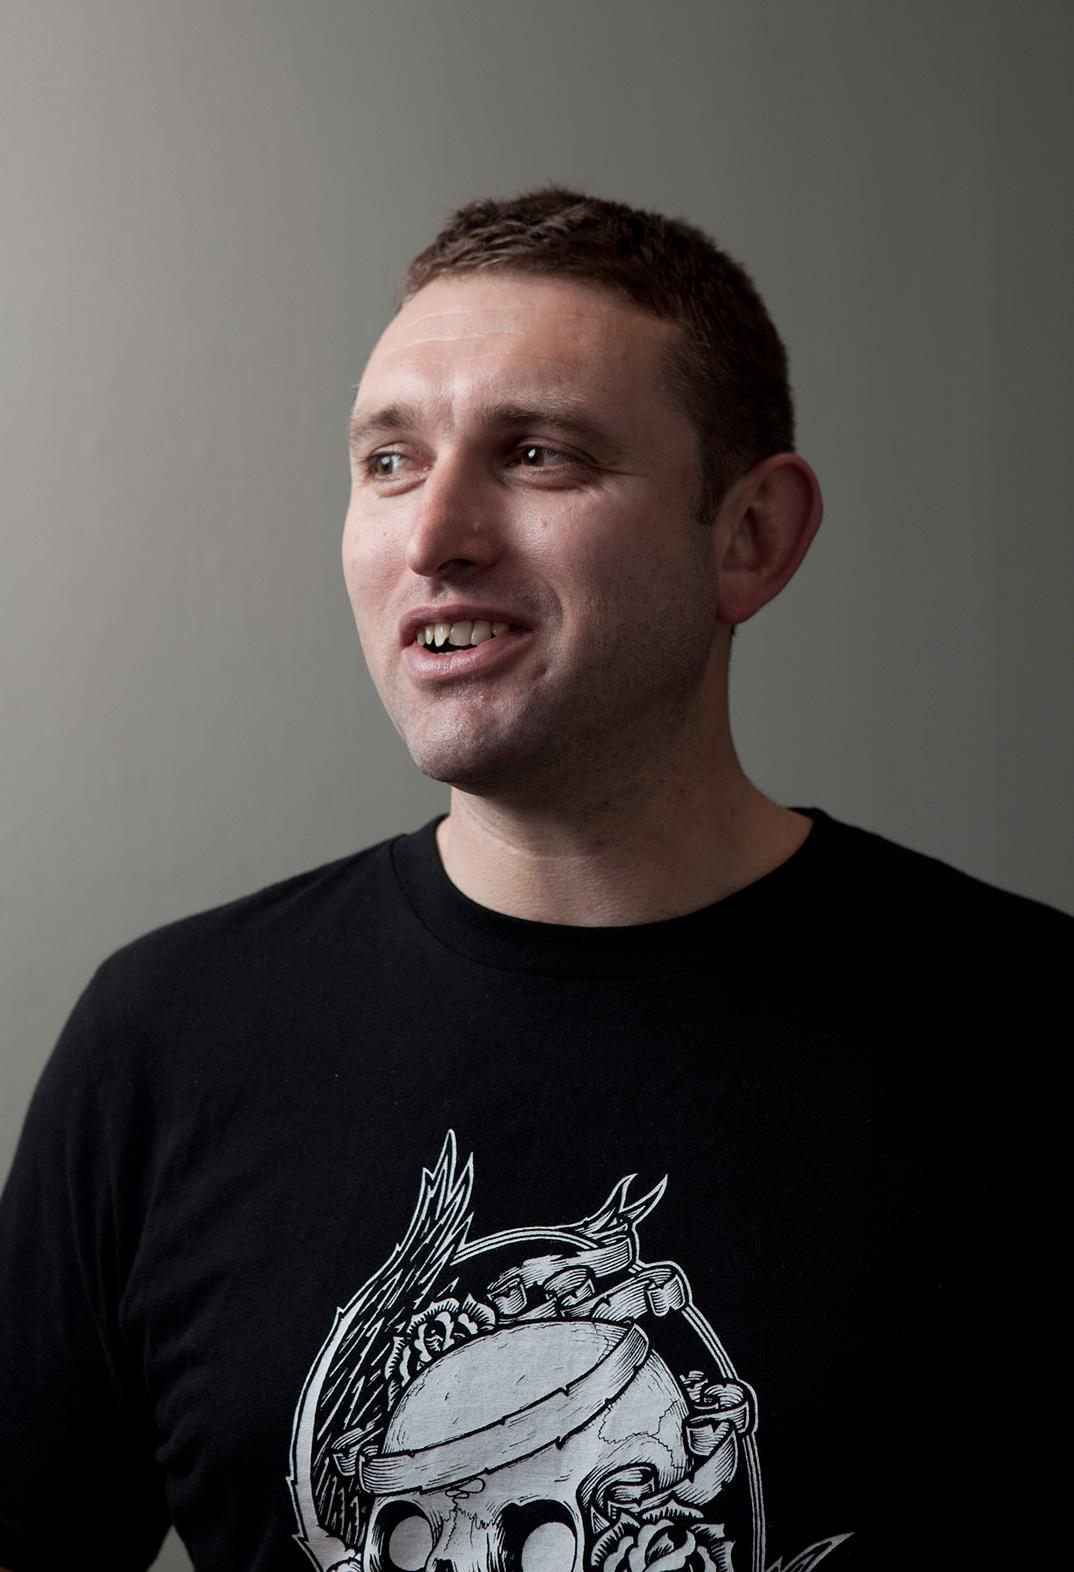 Stuart Brown, BFI